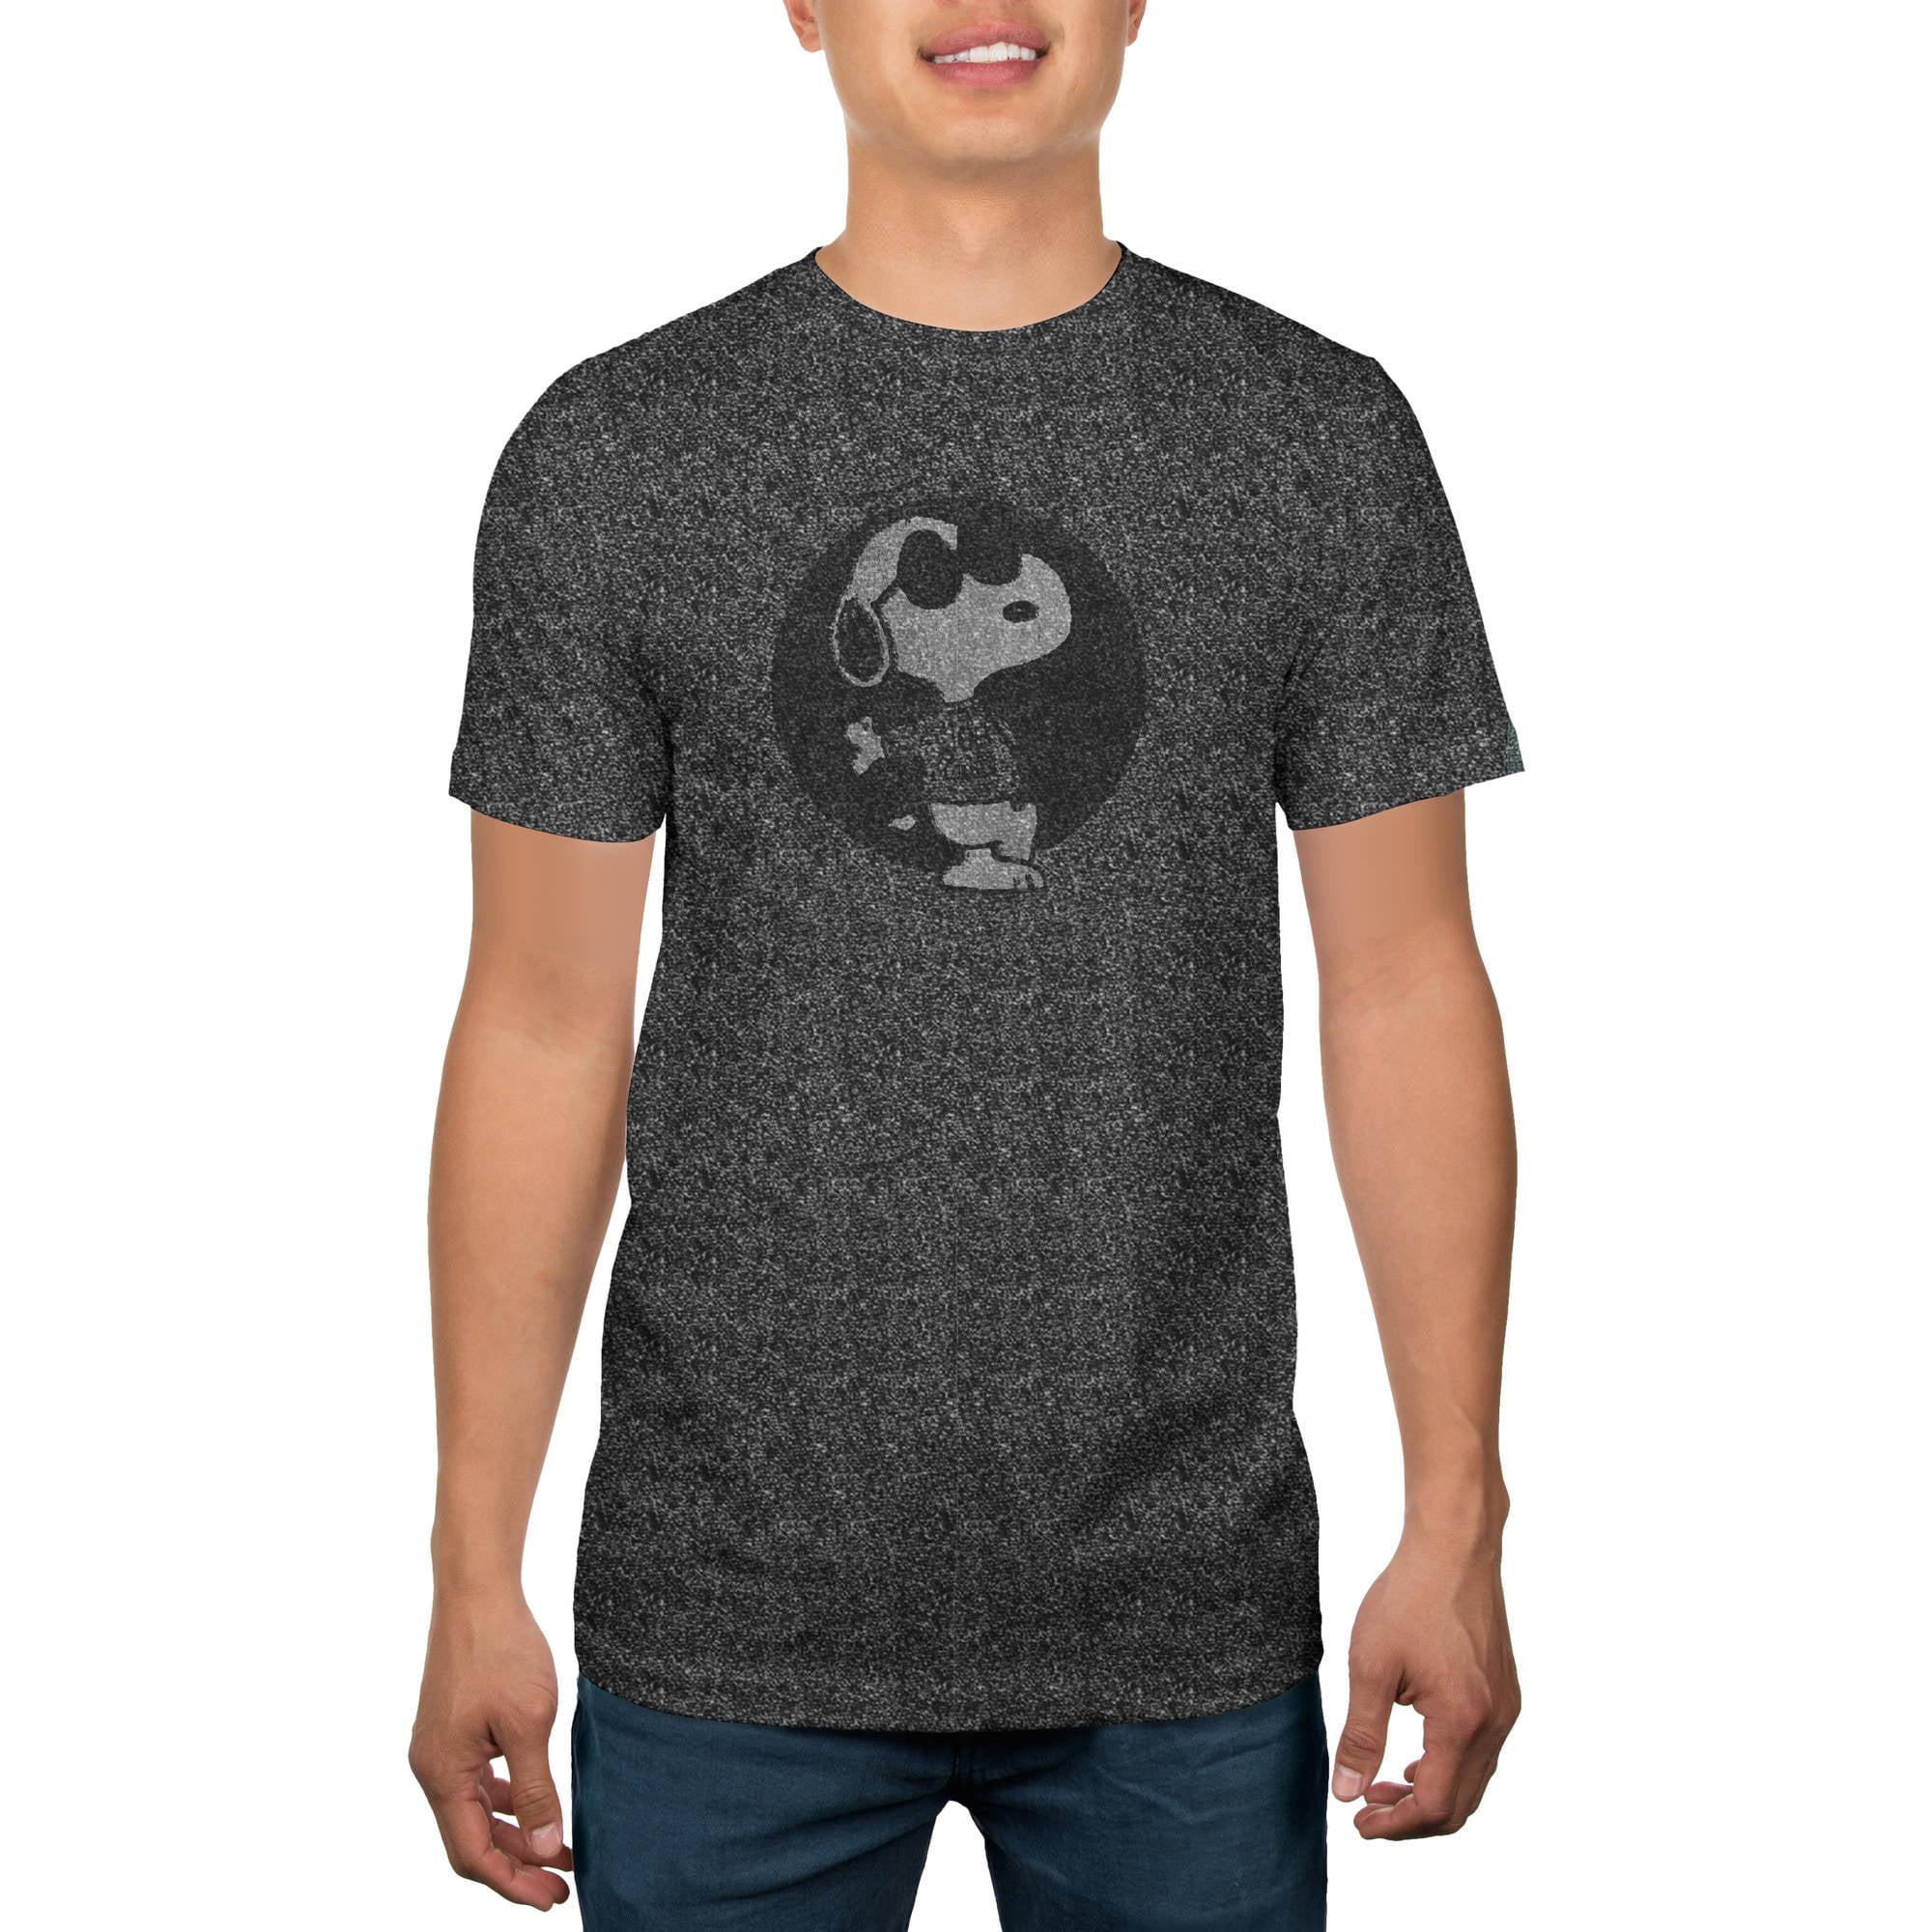 Snoopy Joe Cool Big Men's Graphic Tee, 2XL